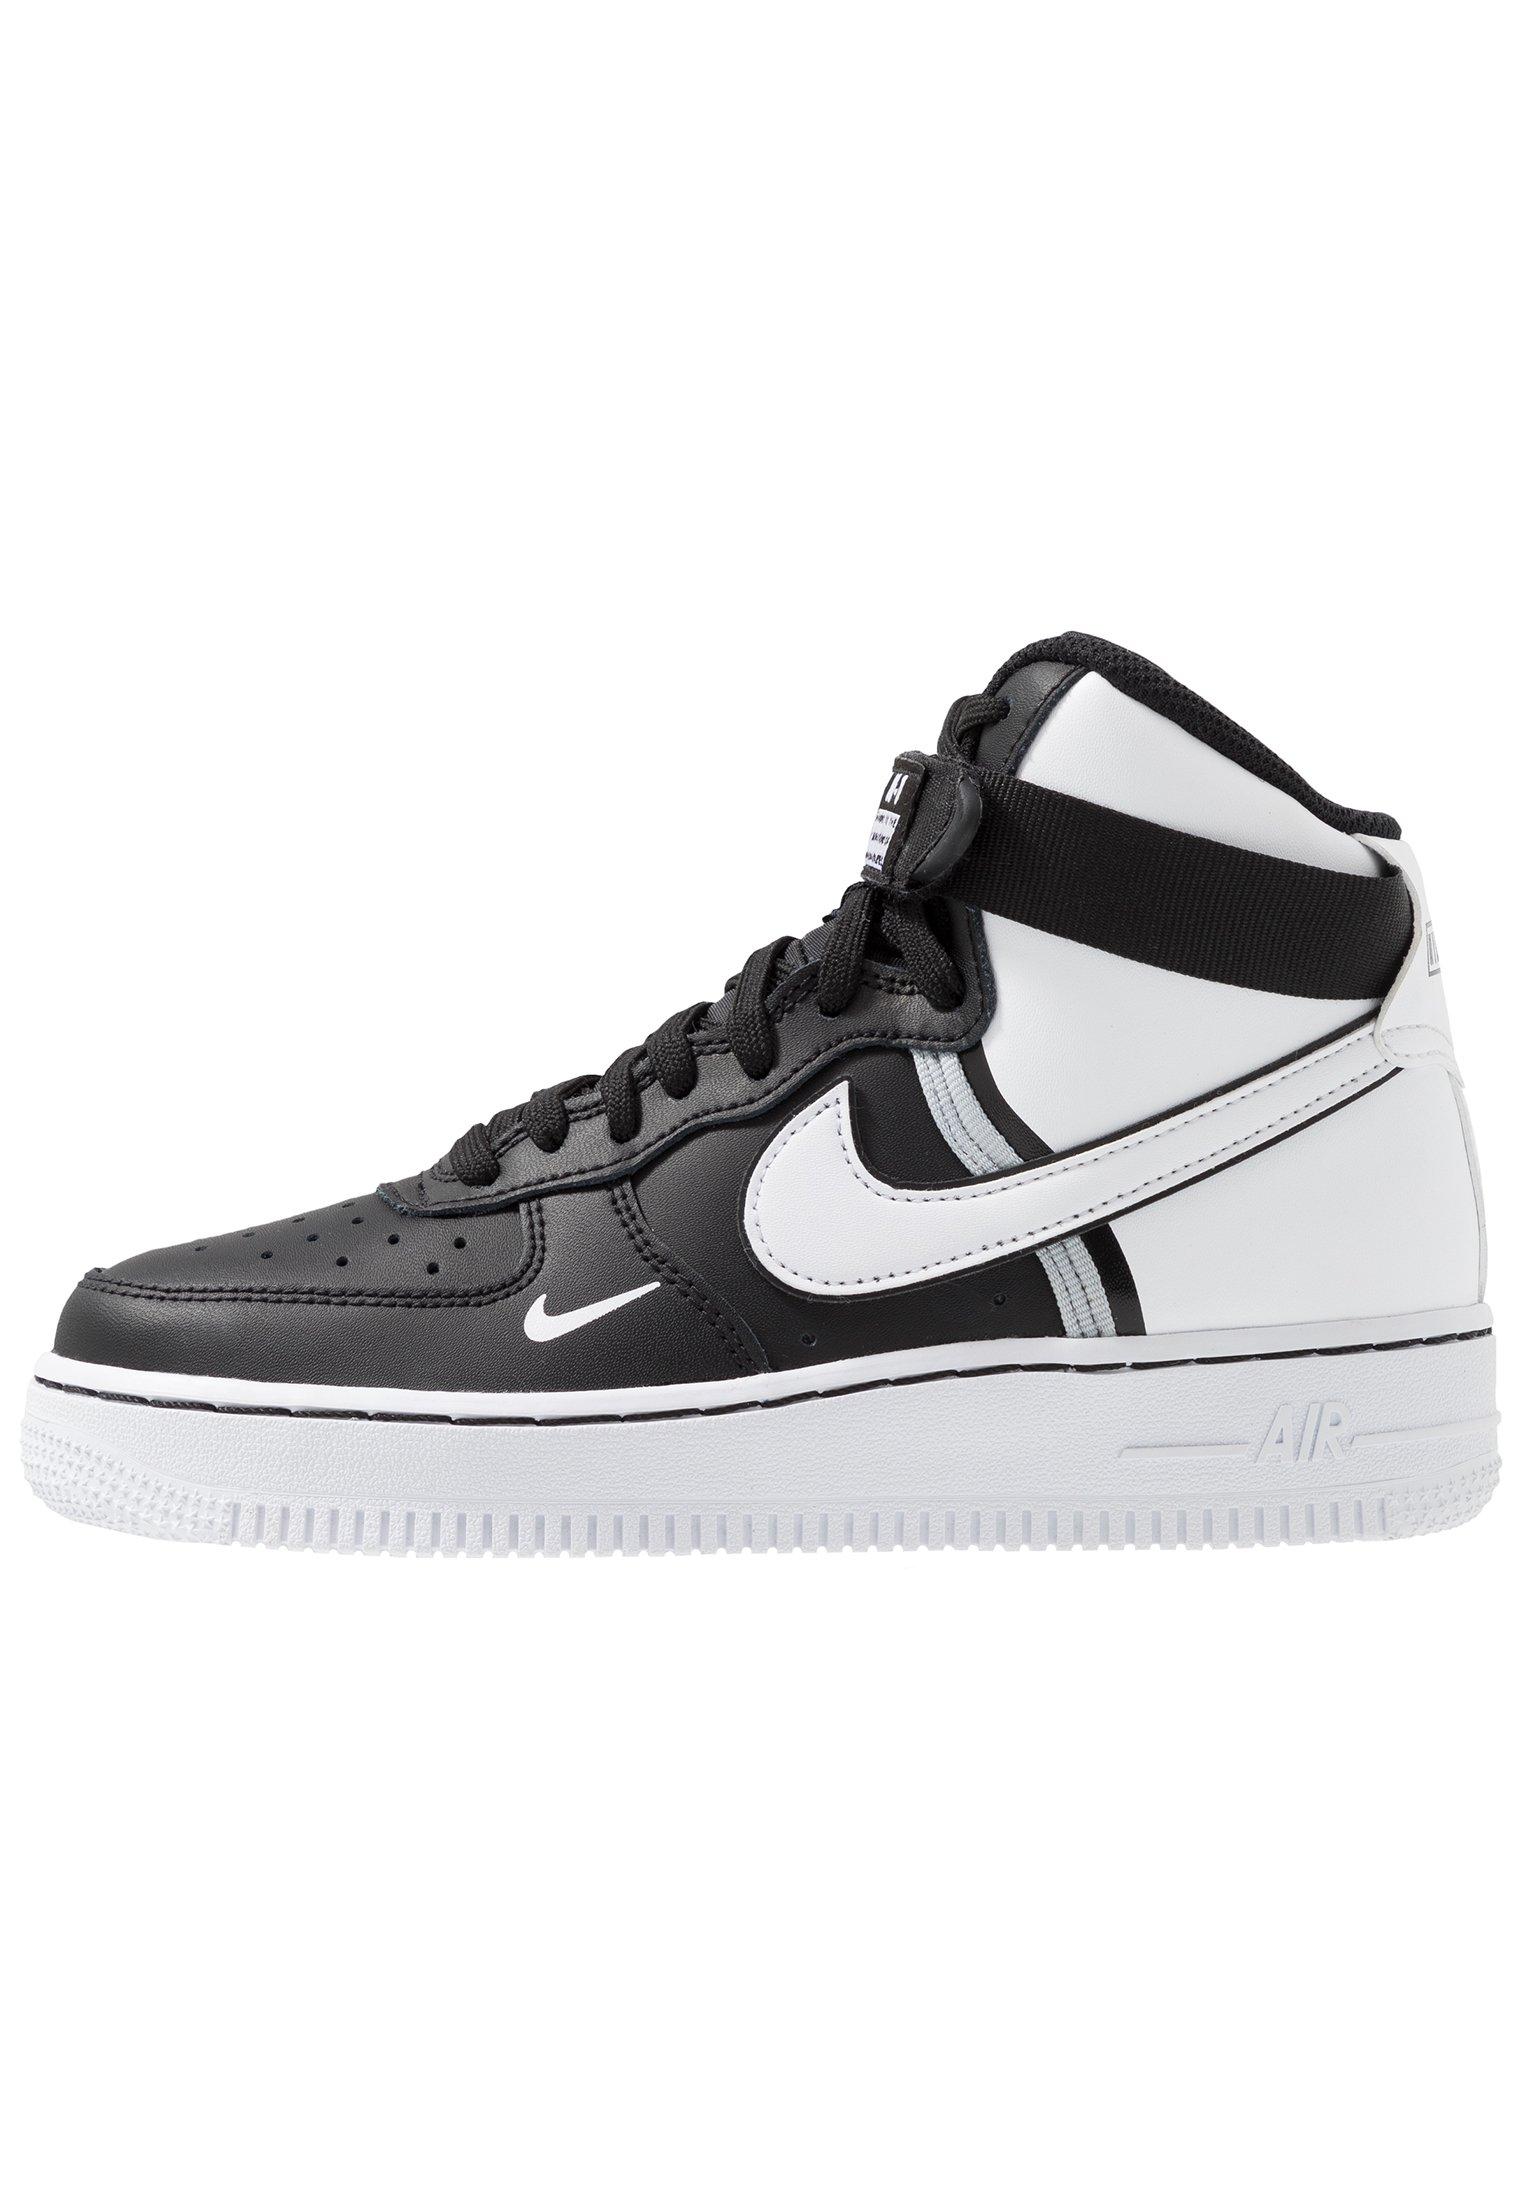 air force 1 alte scarpe